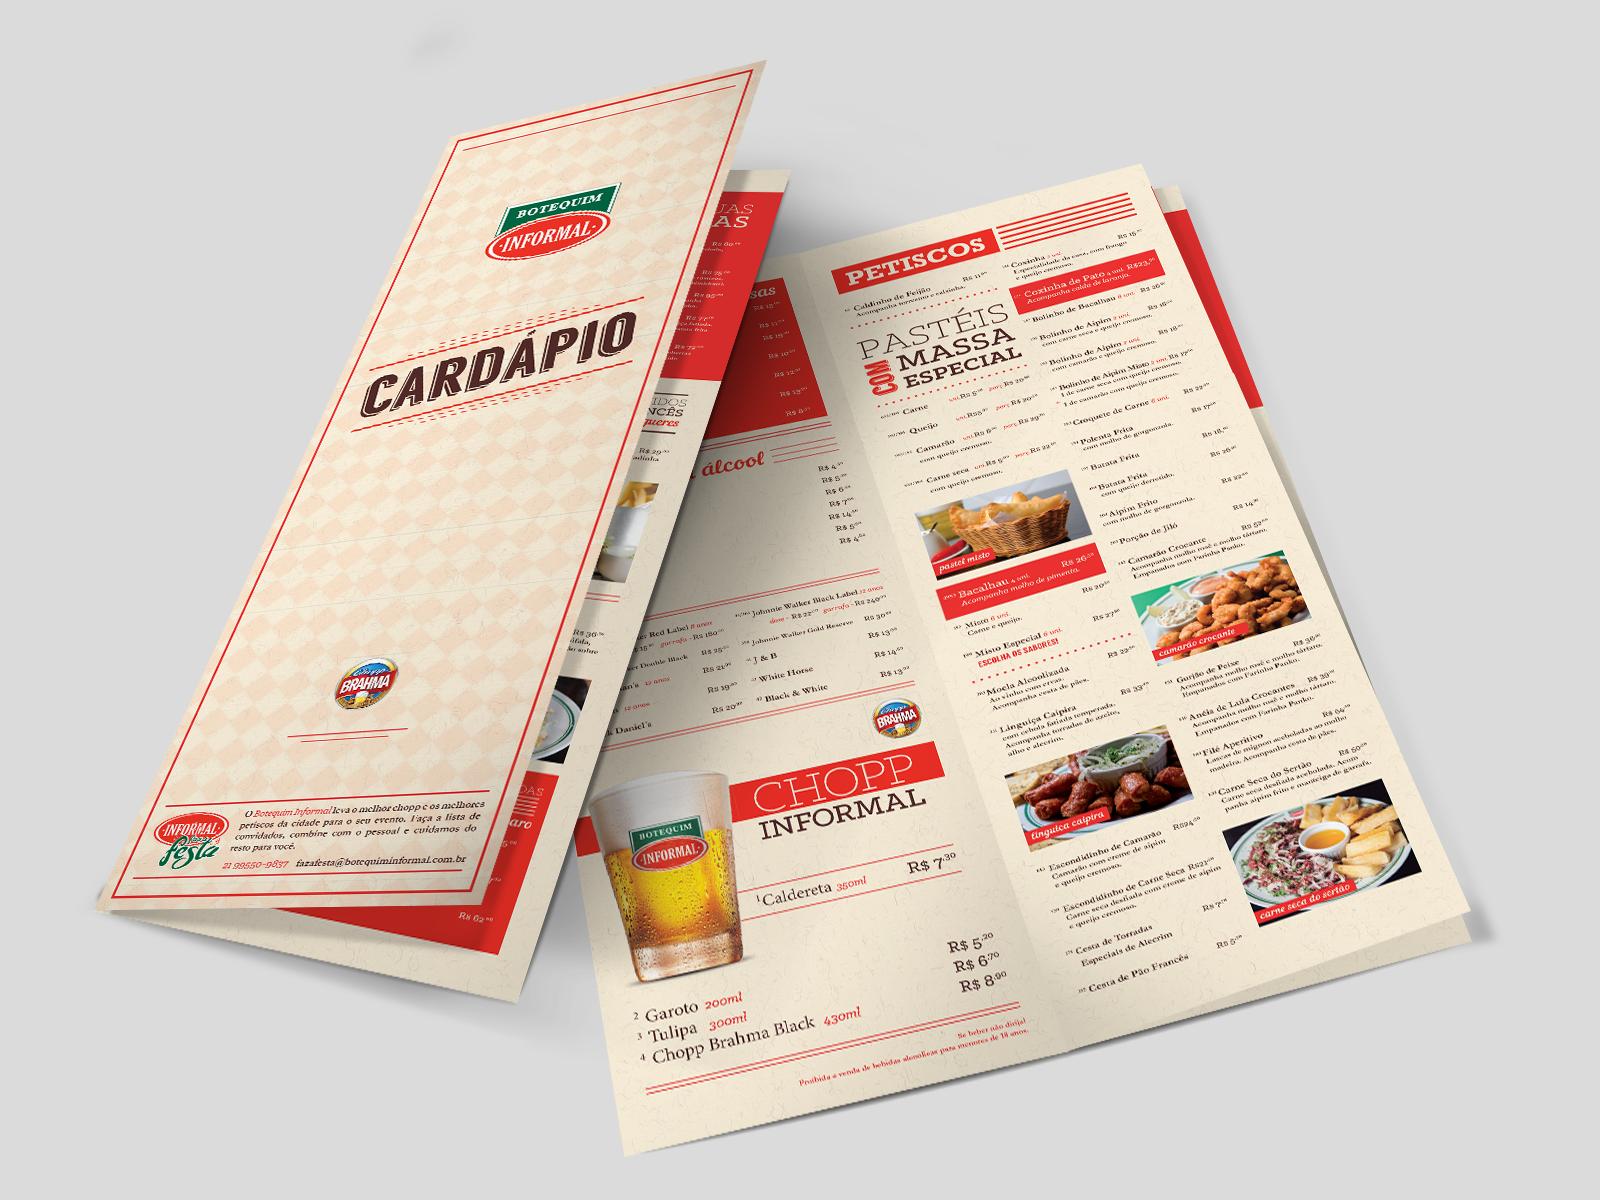 cardapio_composicao